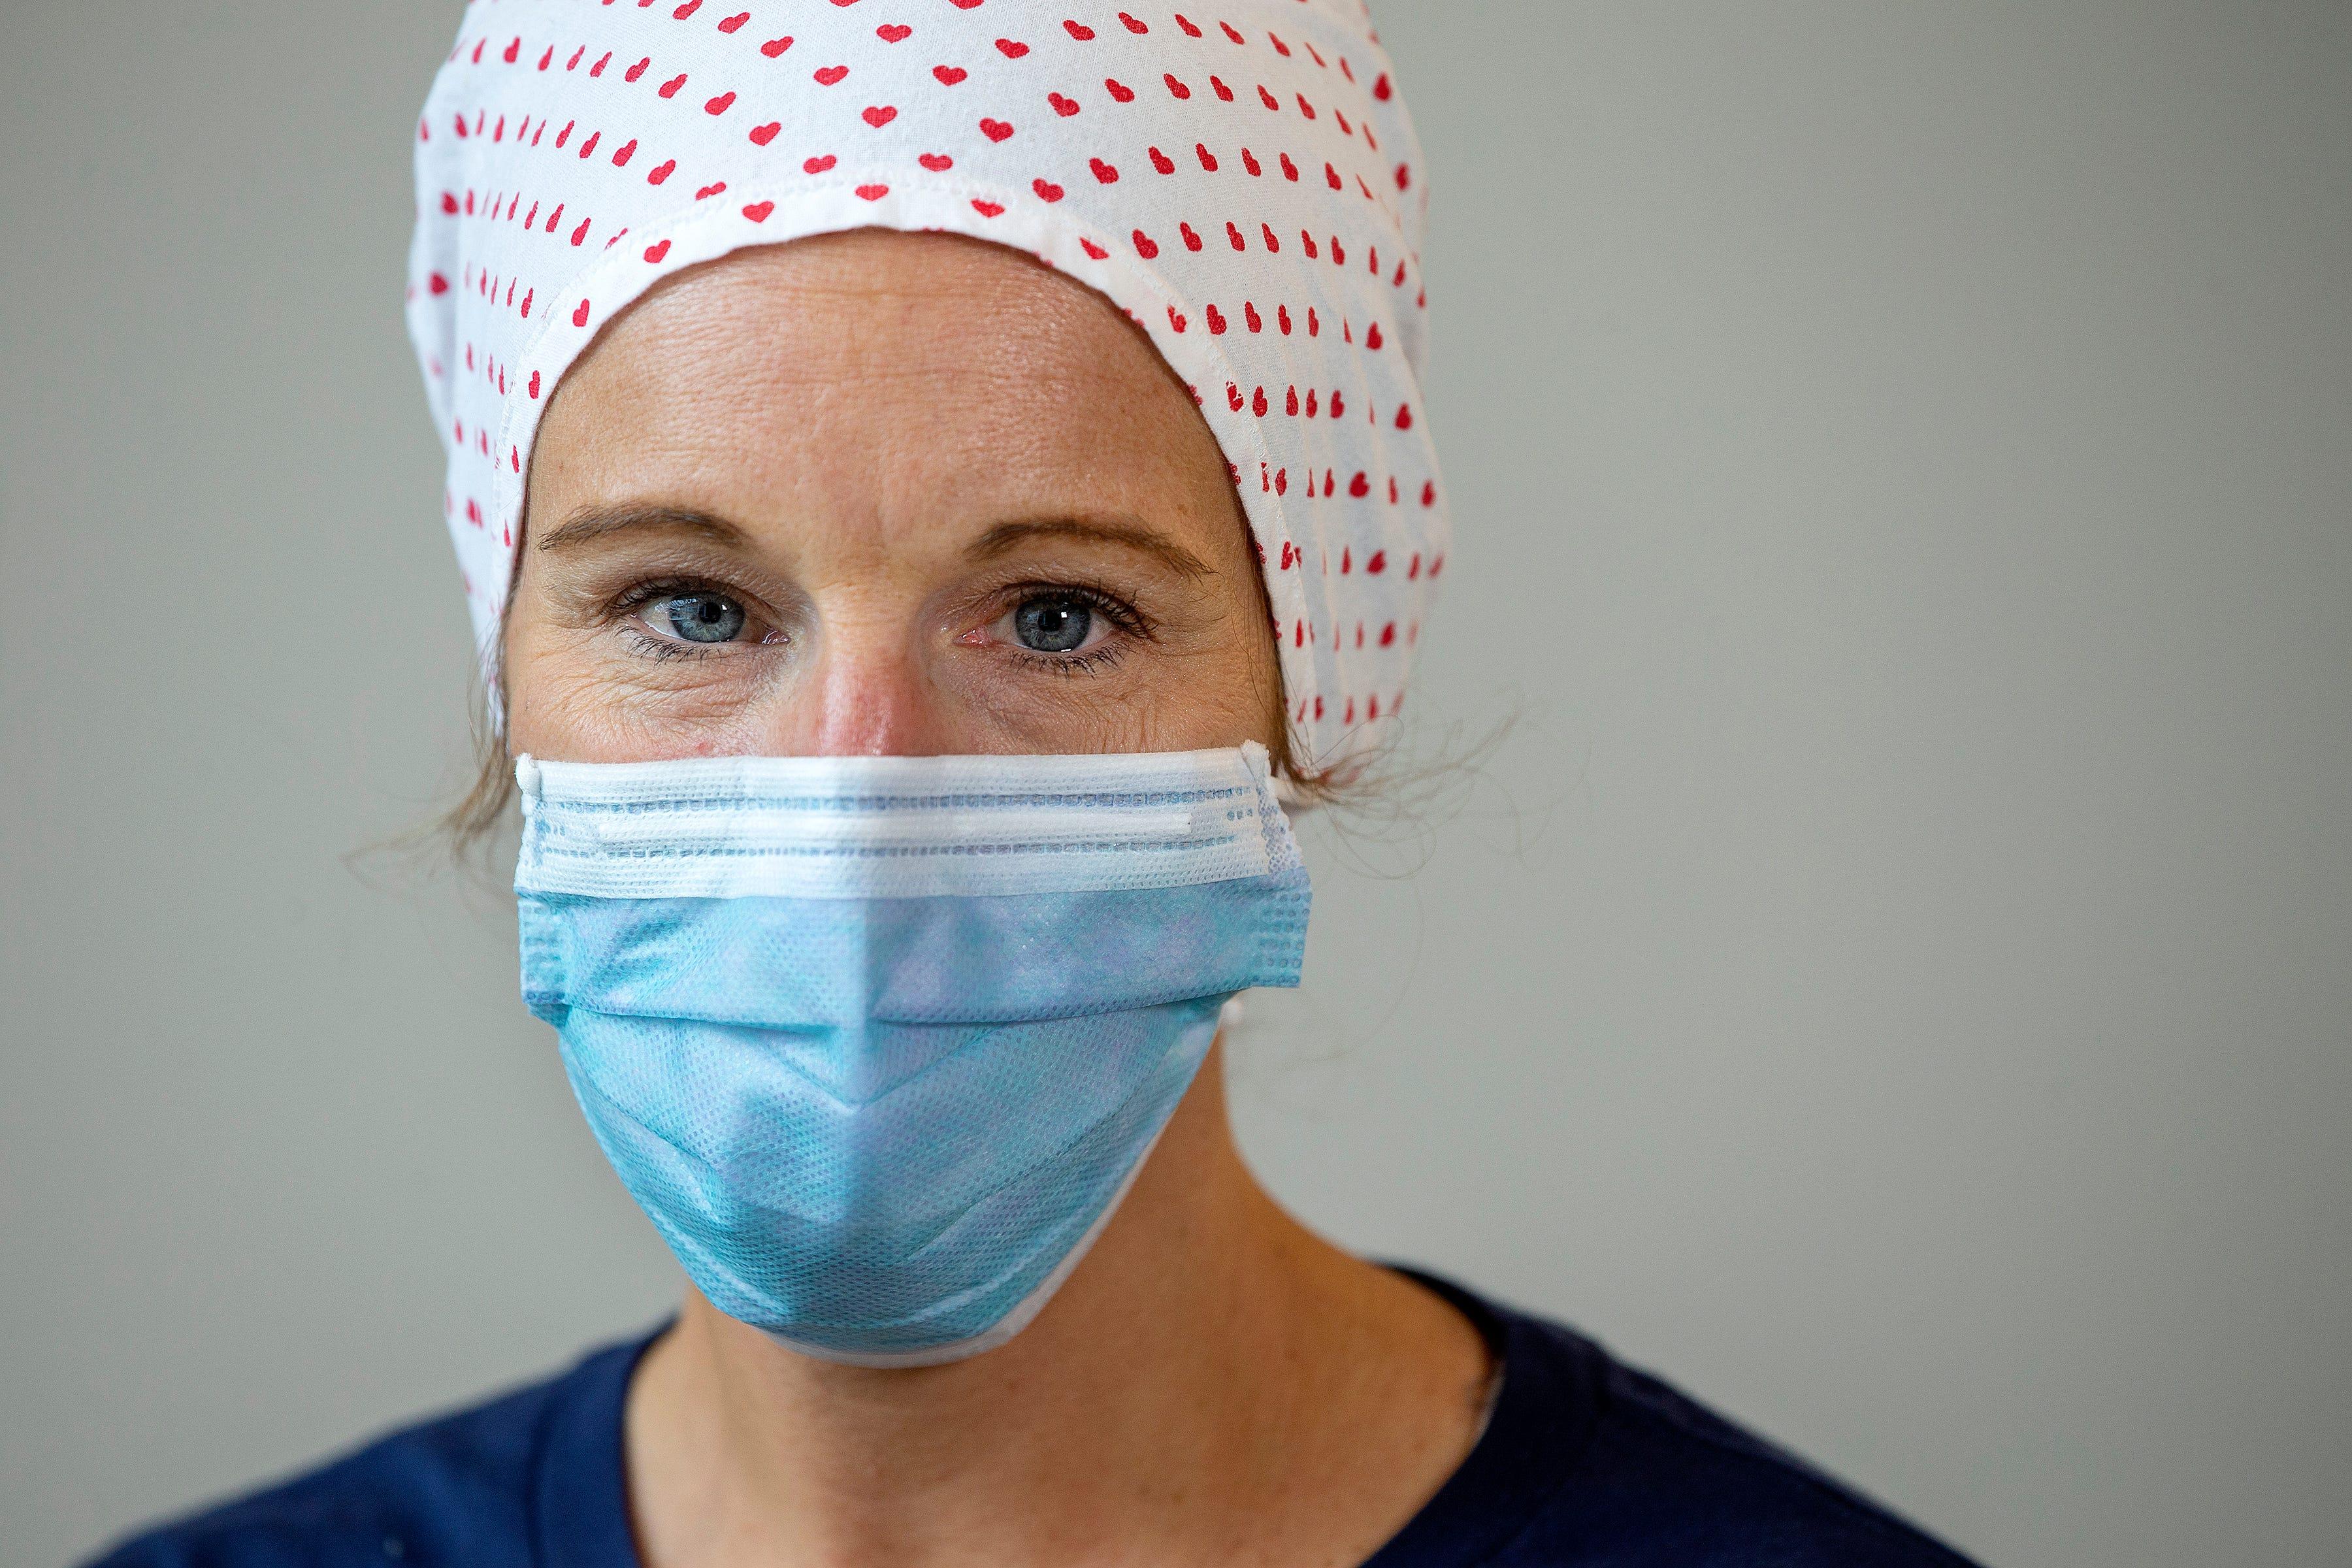 Erin Beagin, 5 South COVID-19 unit nurse, Ocean Medical Center